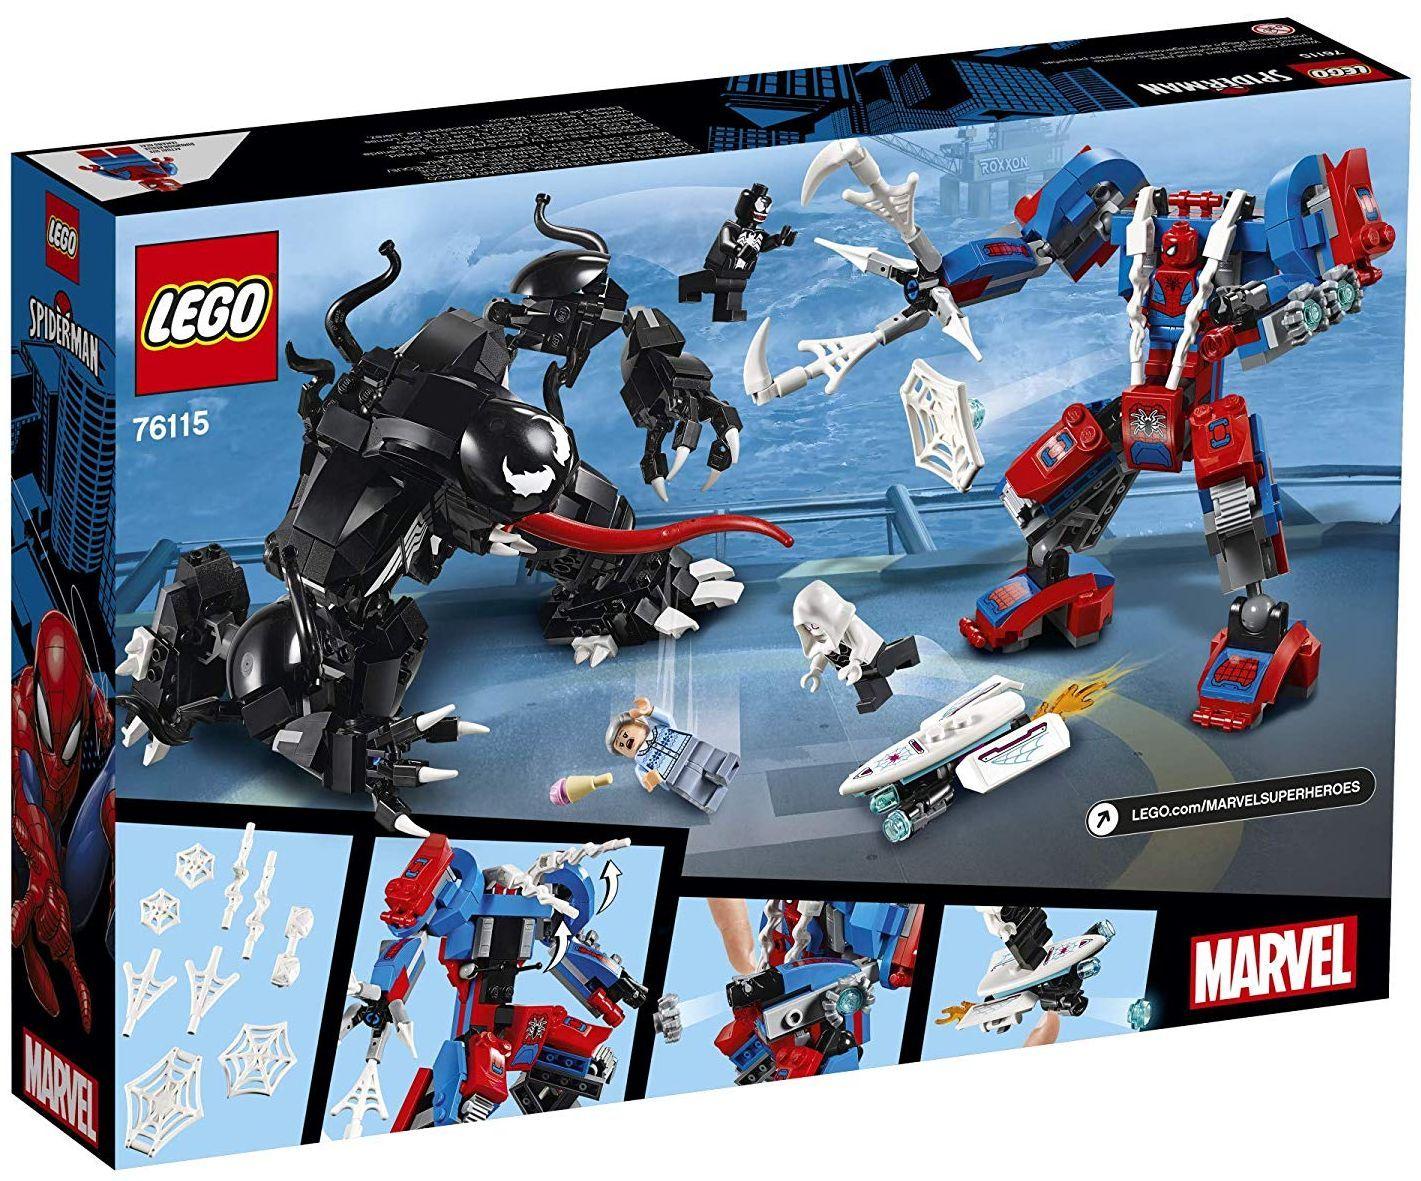 Конструктор Lego Marvel Super Heroes - Spider Mech vs. Venom (76115) - 5